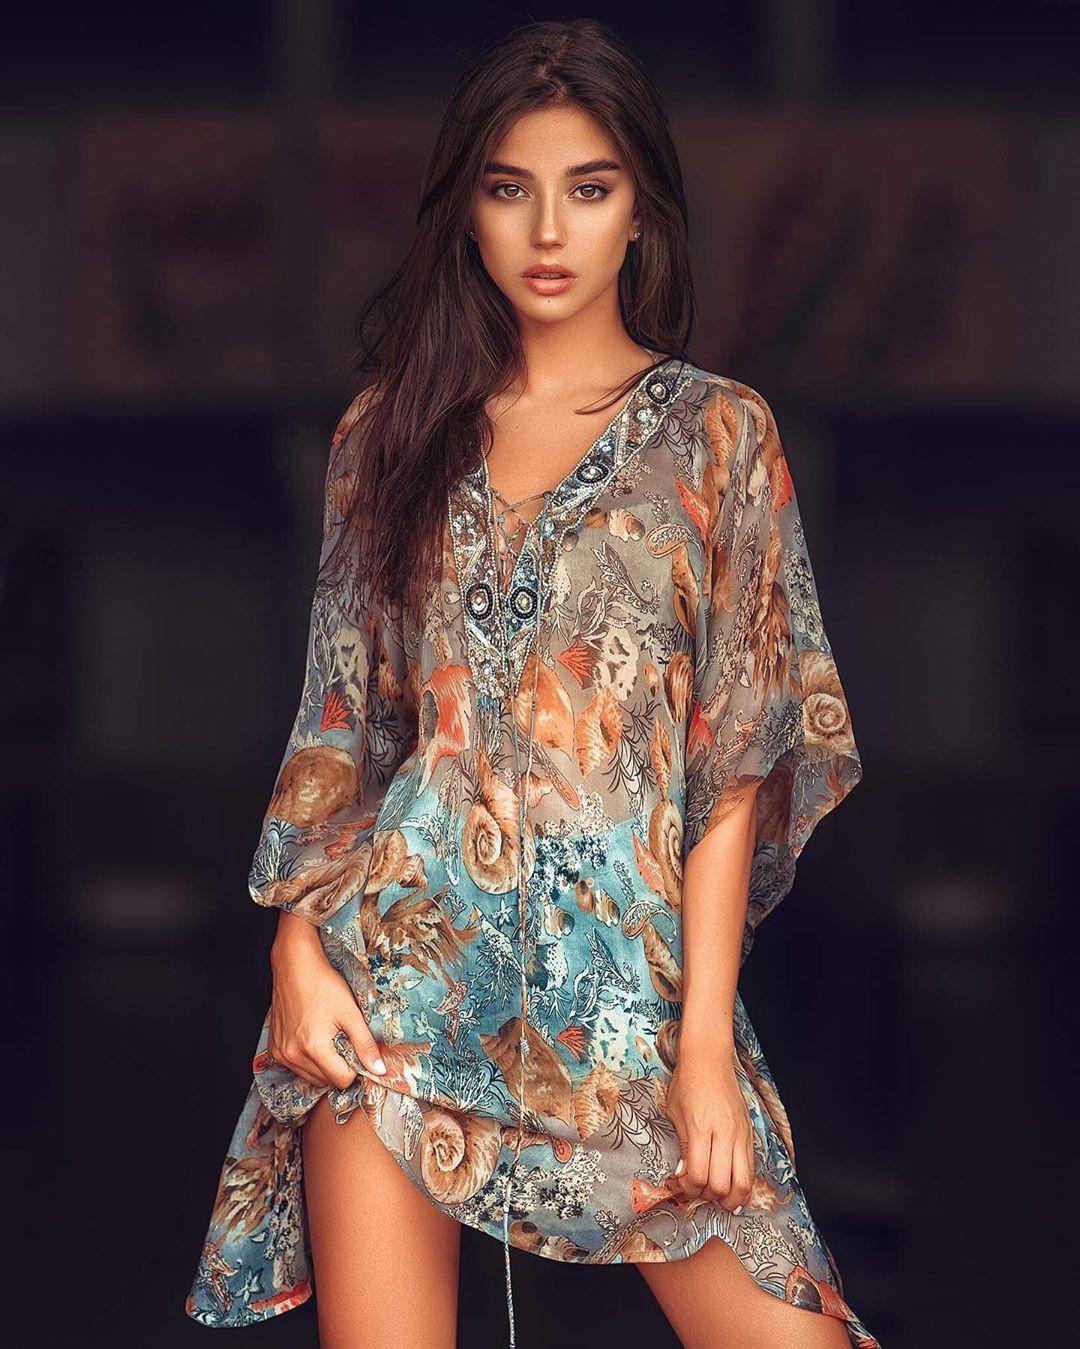 Maja Strojek dress colour combination, fashion photoshoot, woman thighs